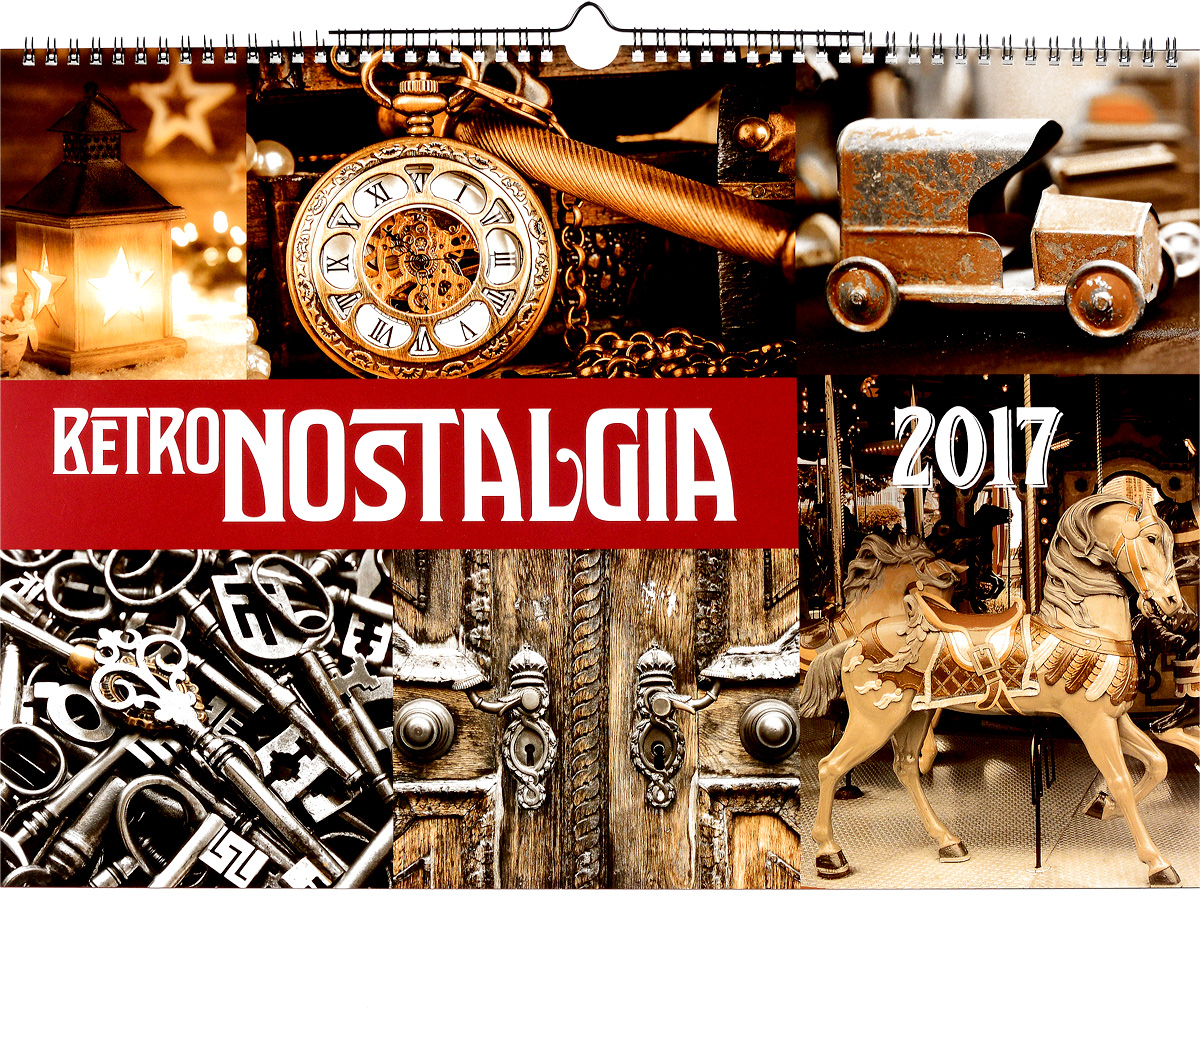 Календарь 2017 (на спирали). Ретро / Retro Nostalgia календарь на 2017 год на спирали retro nostalgia ретро 450 315мм